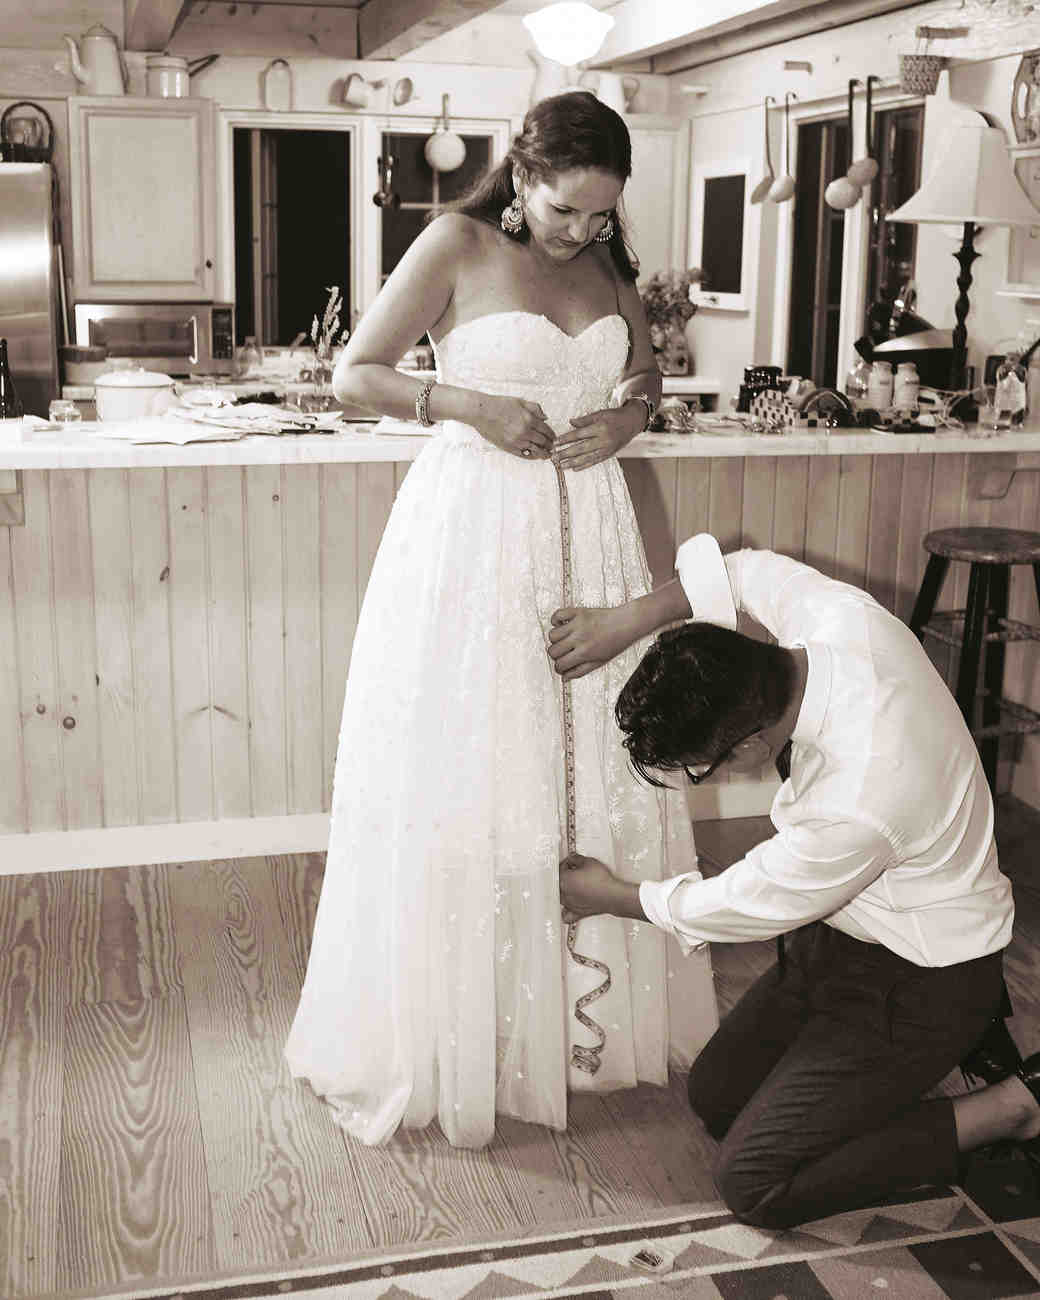 mfiona-peter-wedding-vermont-measuring-brides-dress-d3s.556.2015.47-d112512.jpg